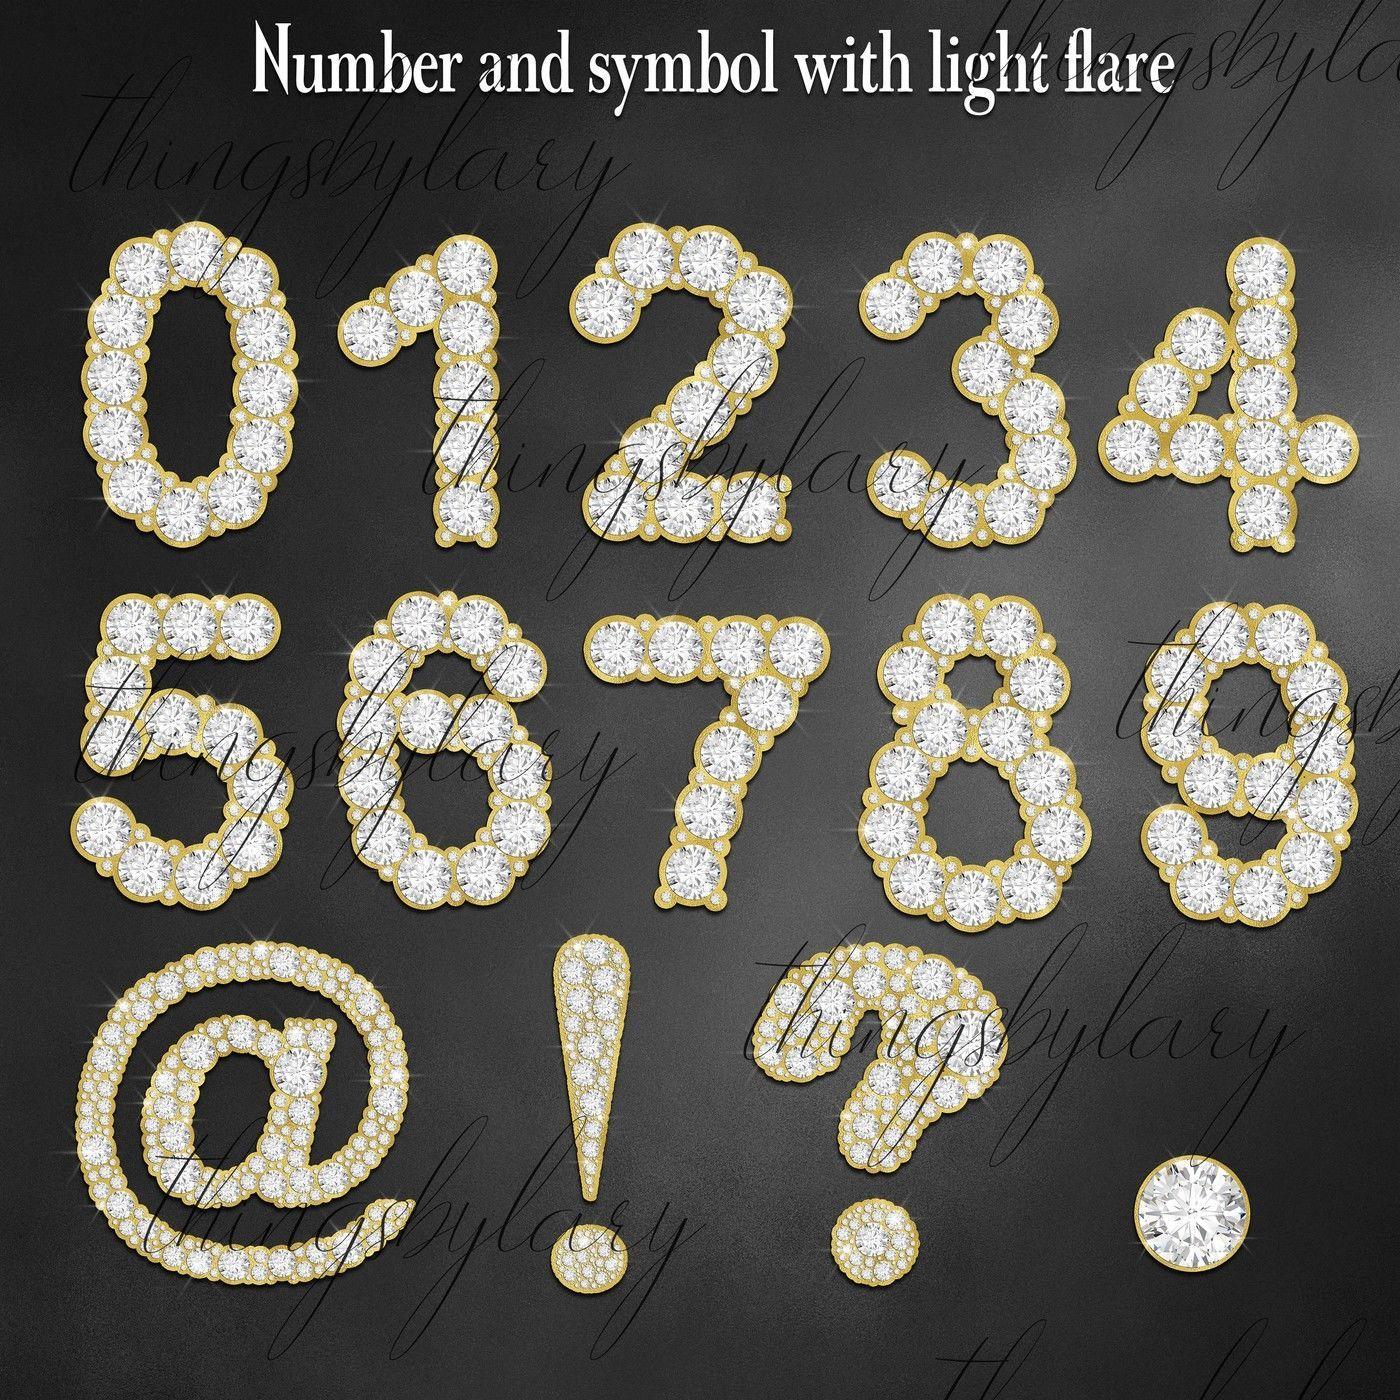 81 Gold And Diamond Alphabet Number Symbol Clip Art Not Font By Artinsider Thehungryjpeg Com Alphabet Sponsored Number Dia Clip Art Symbols Light Flare